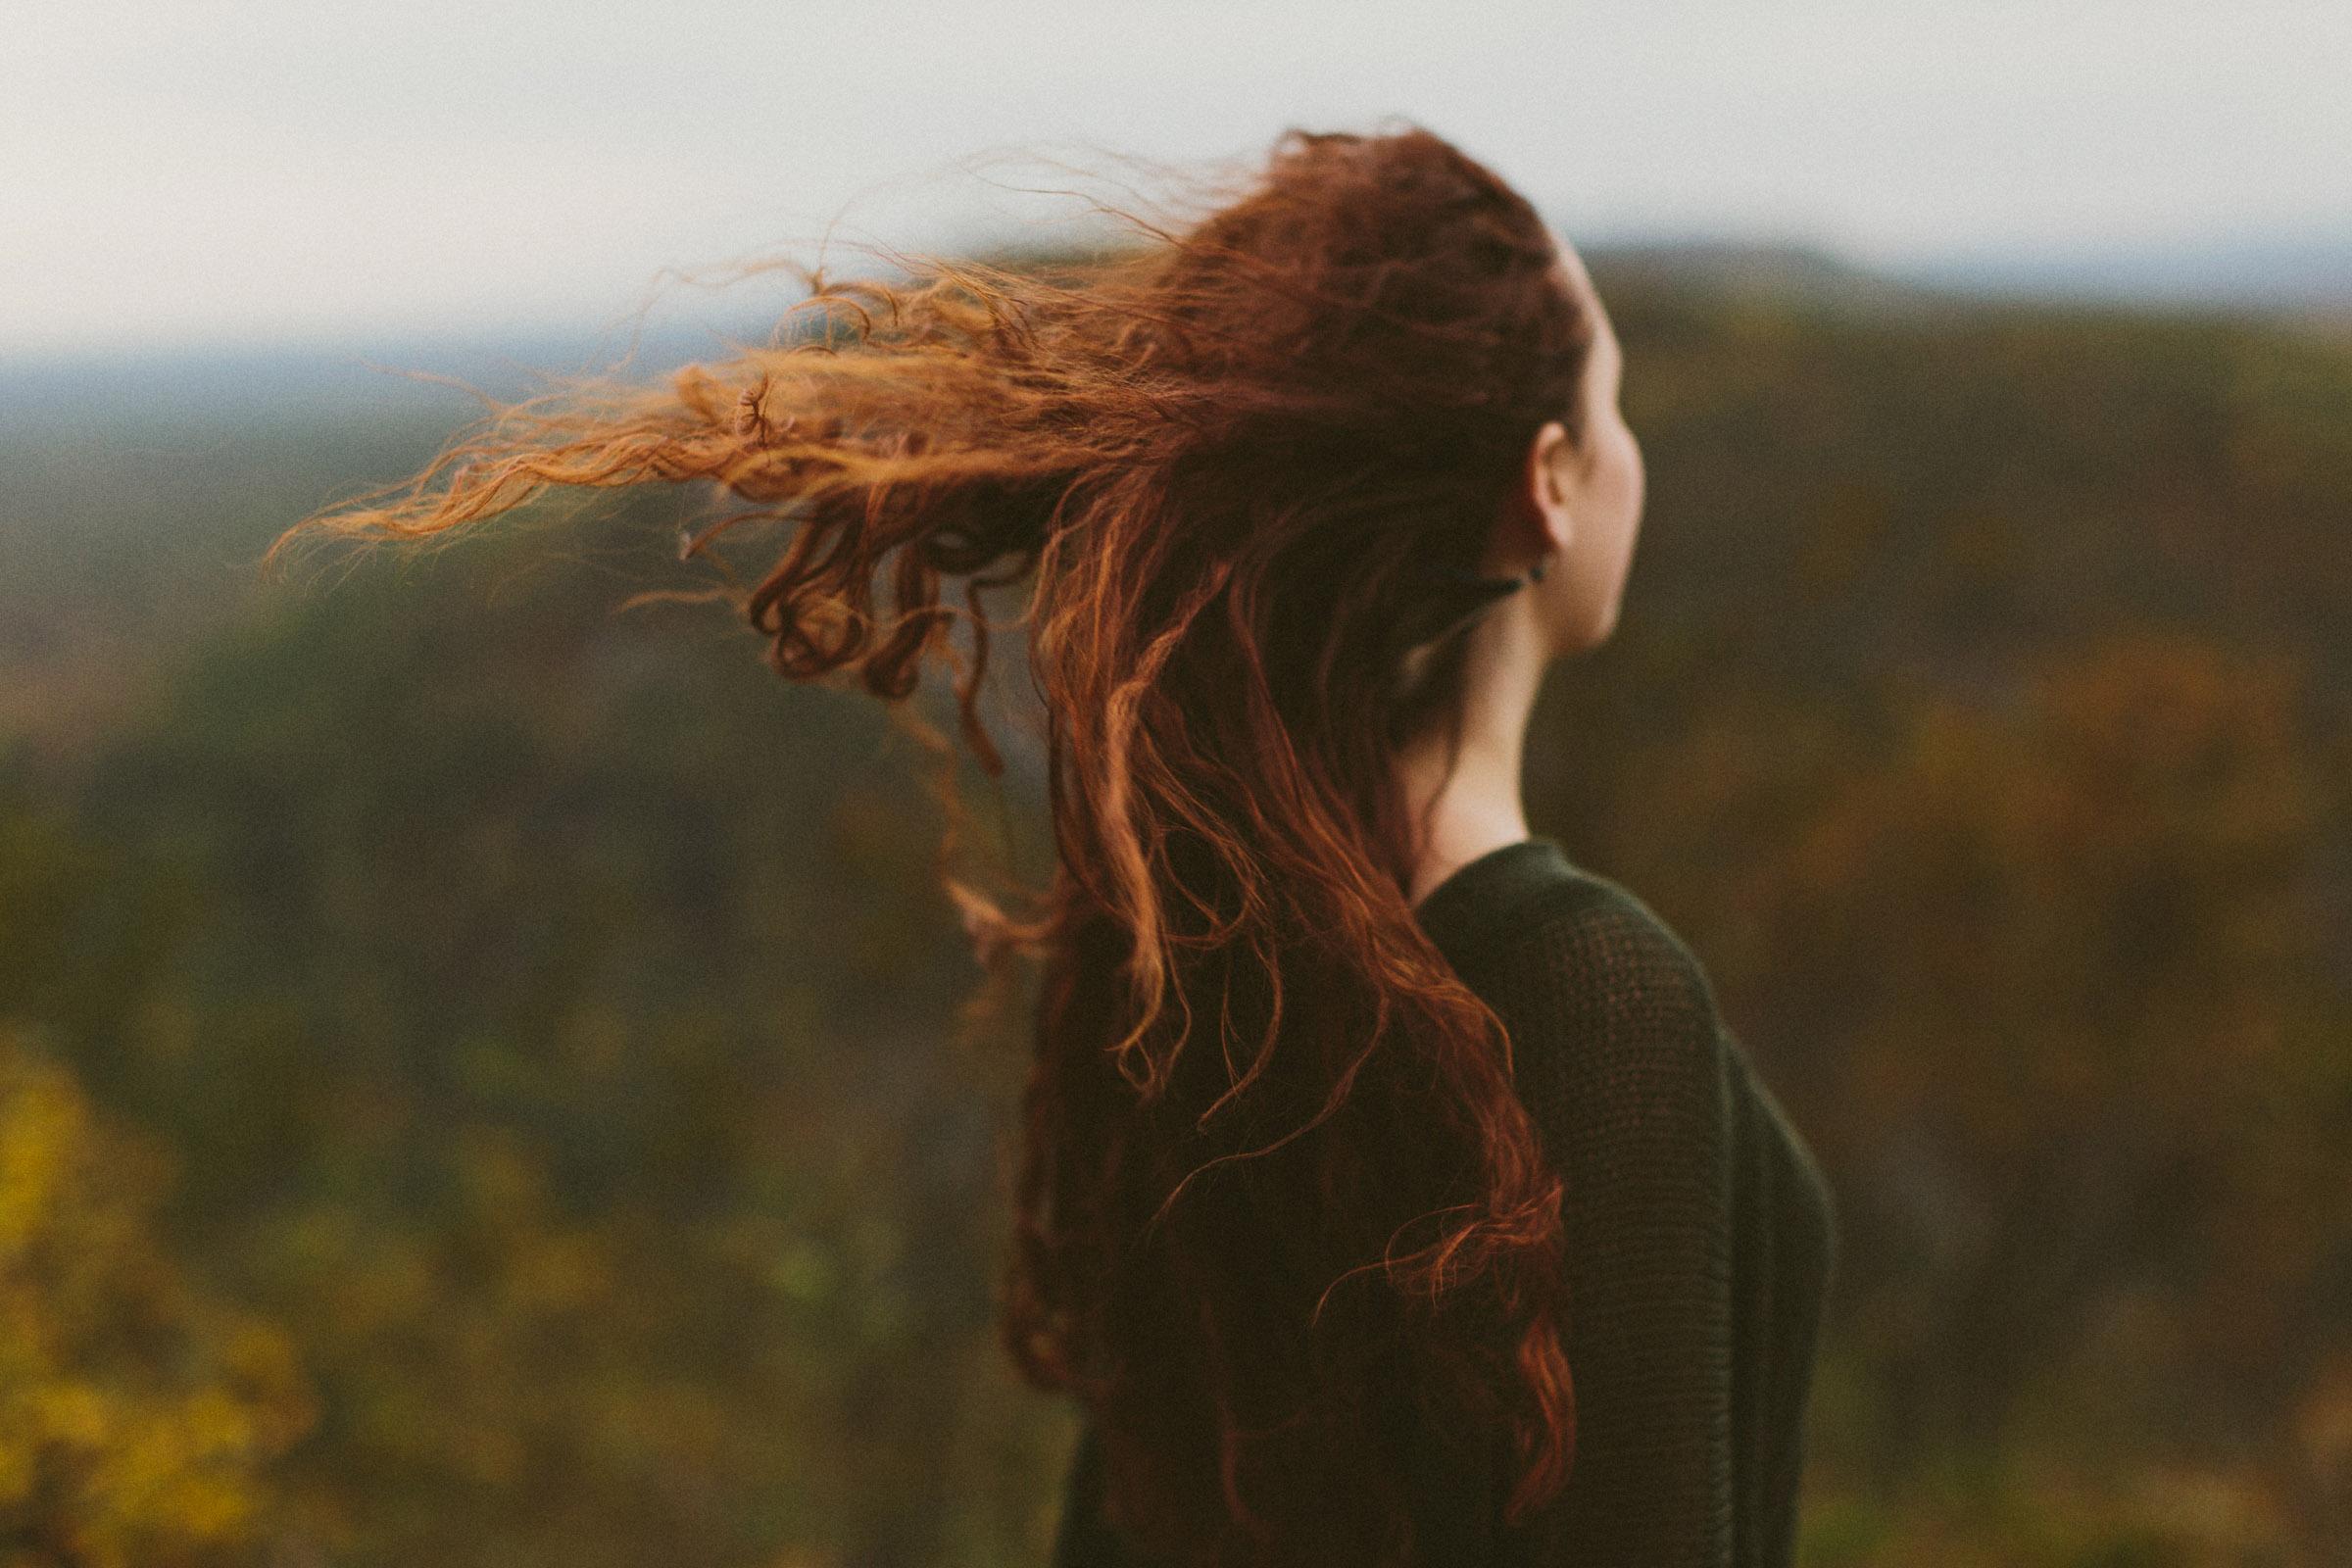 Outdoor adventure portrait | Katch Silva